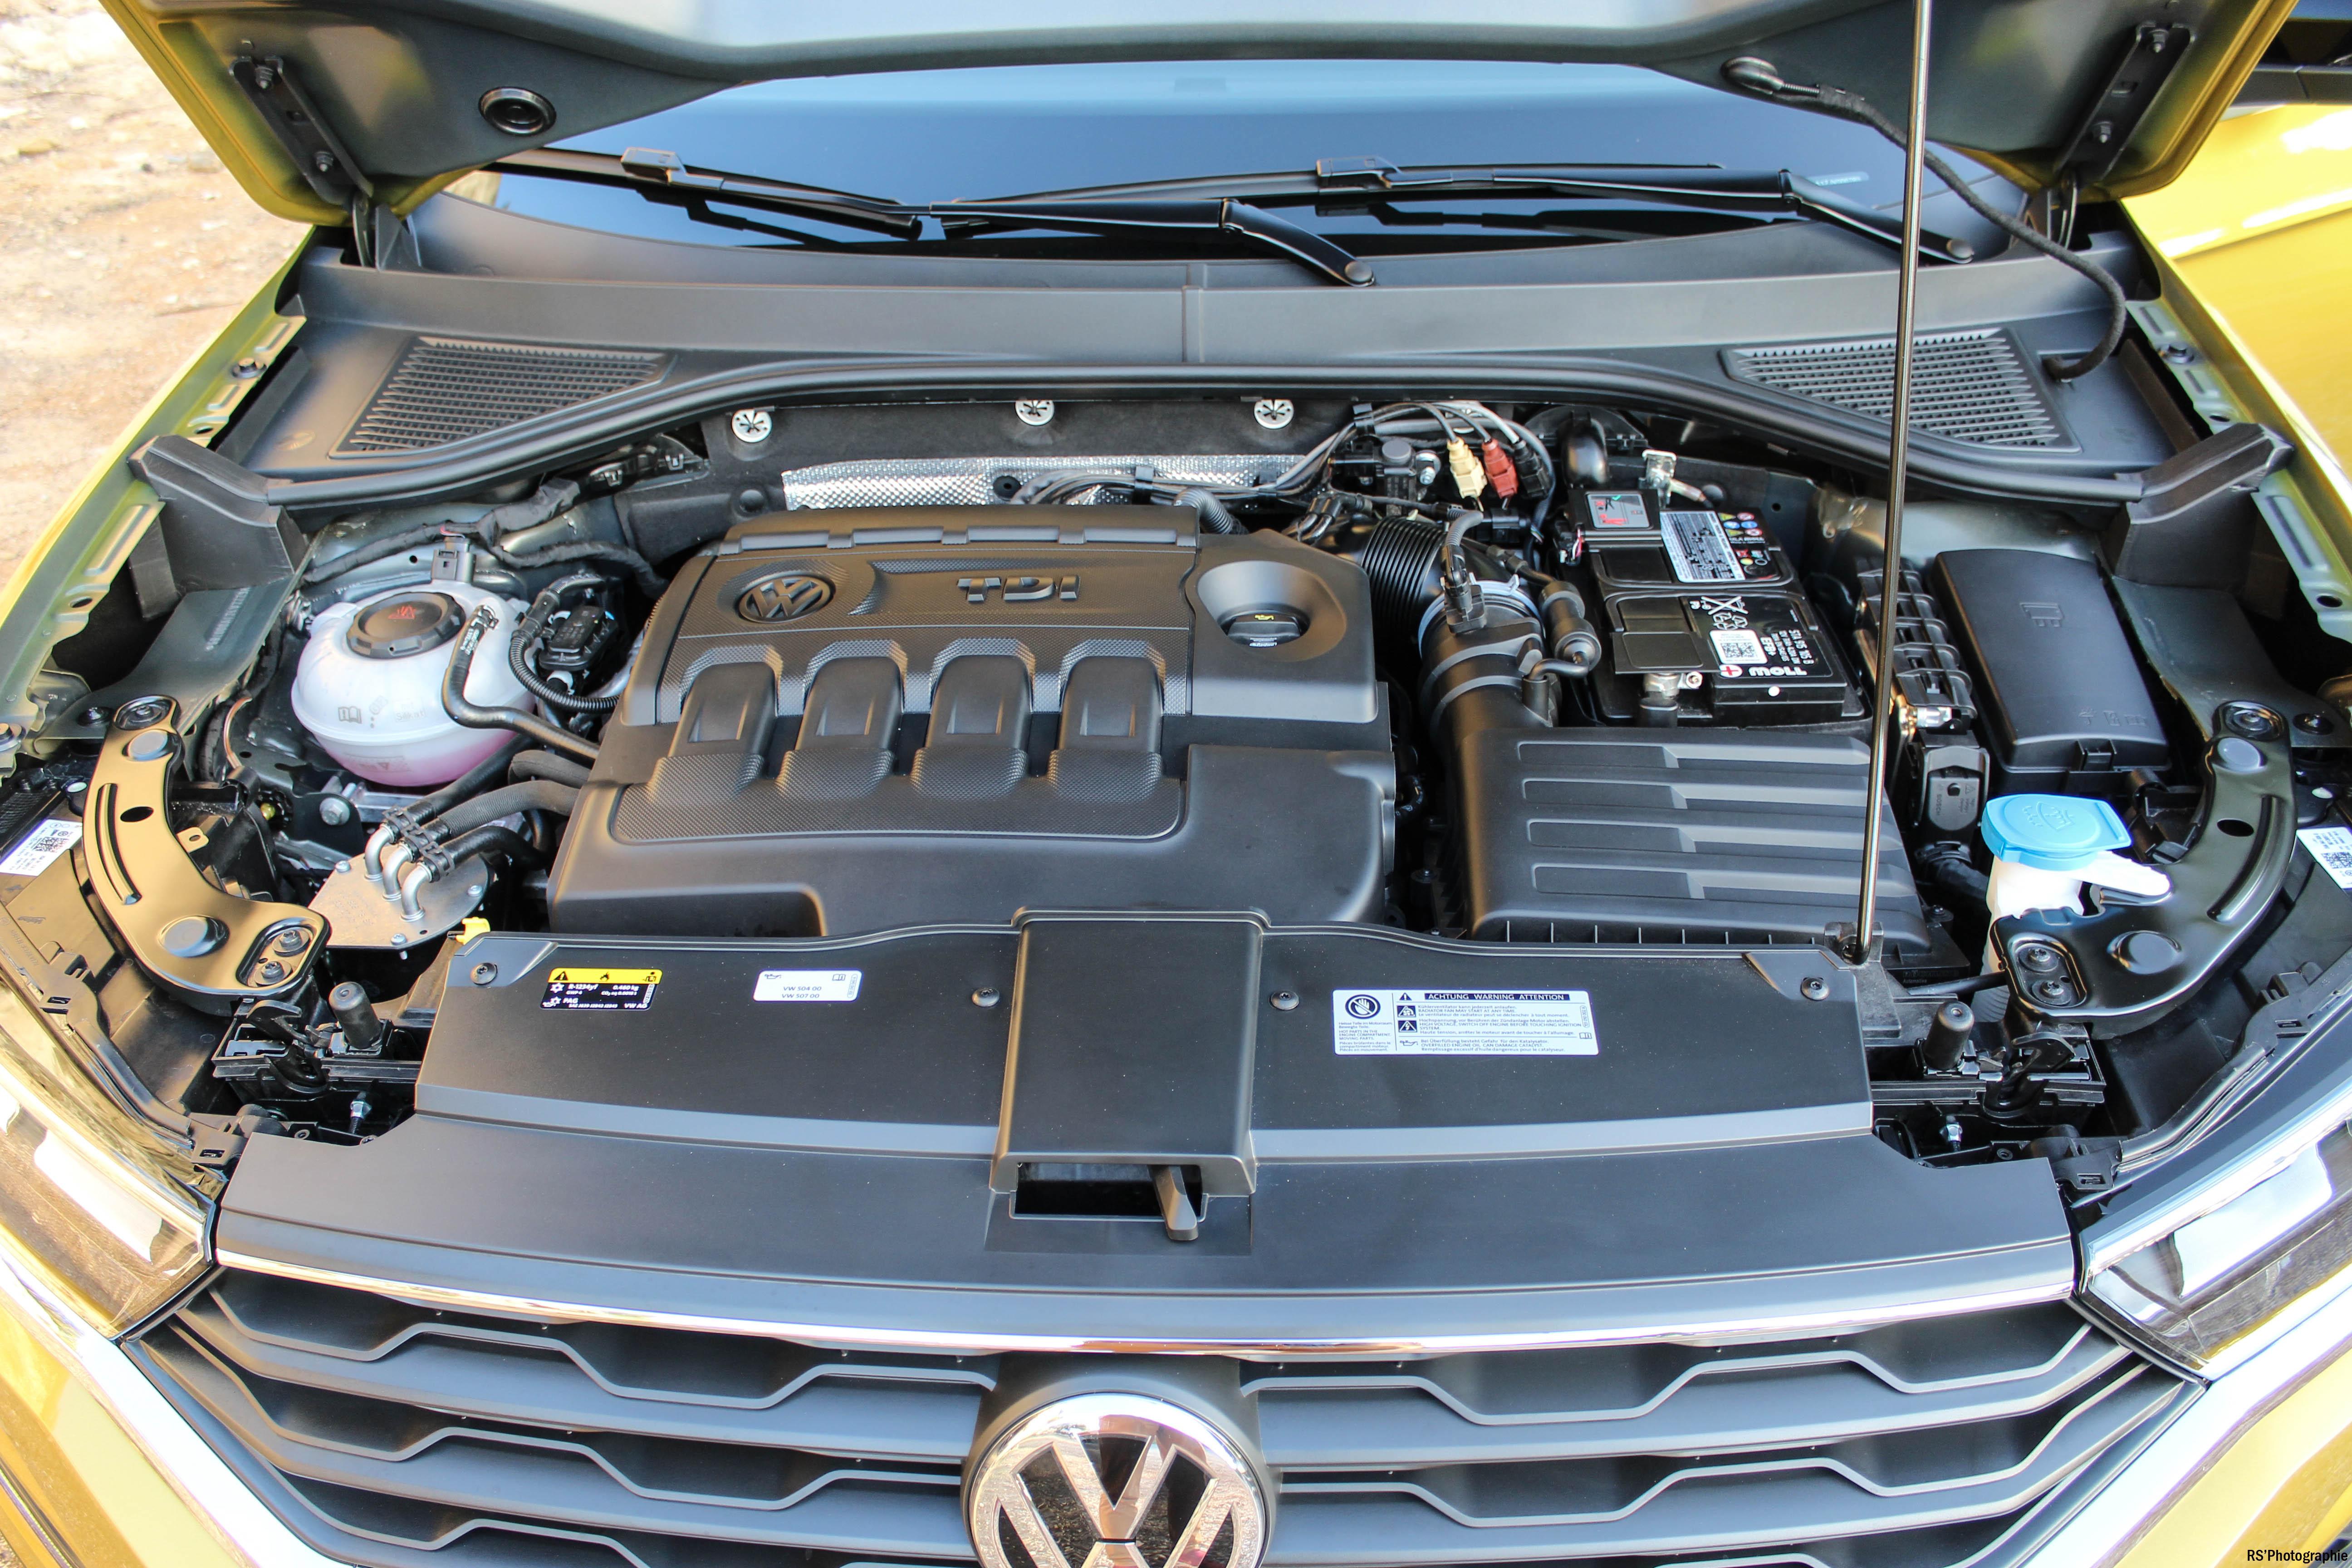 Volkswagentroc79-vw-t-roc-moteur-engine-Arnaud Demasier-RSPhotographie